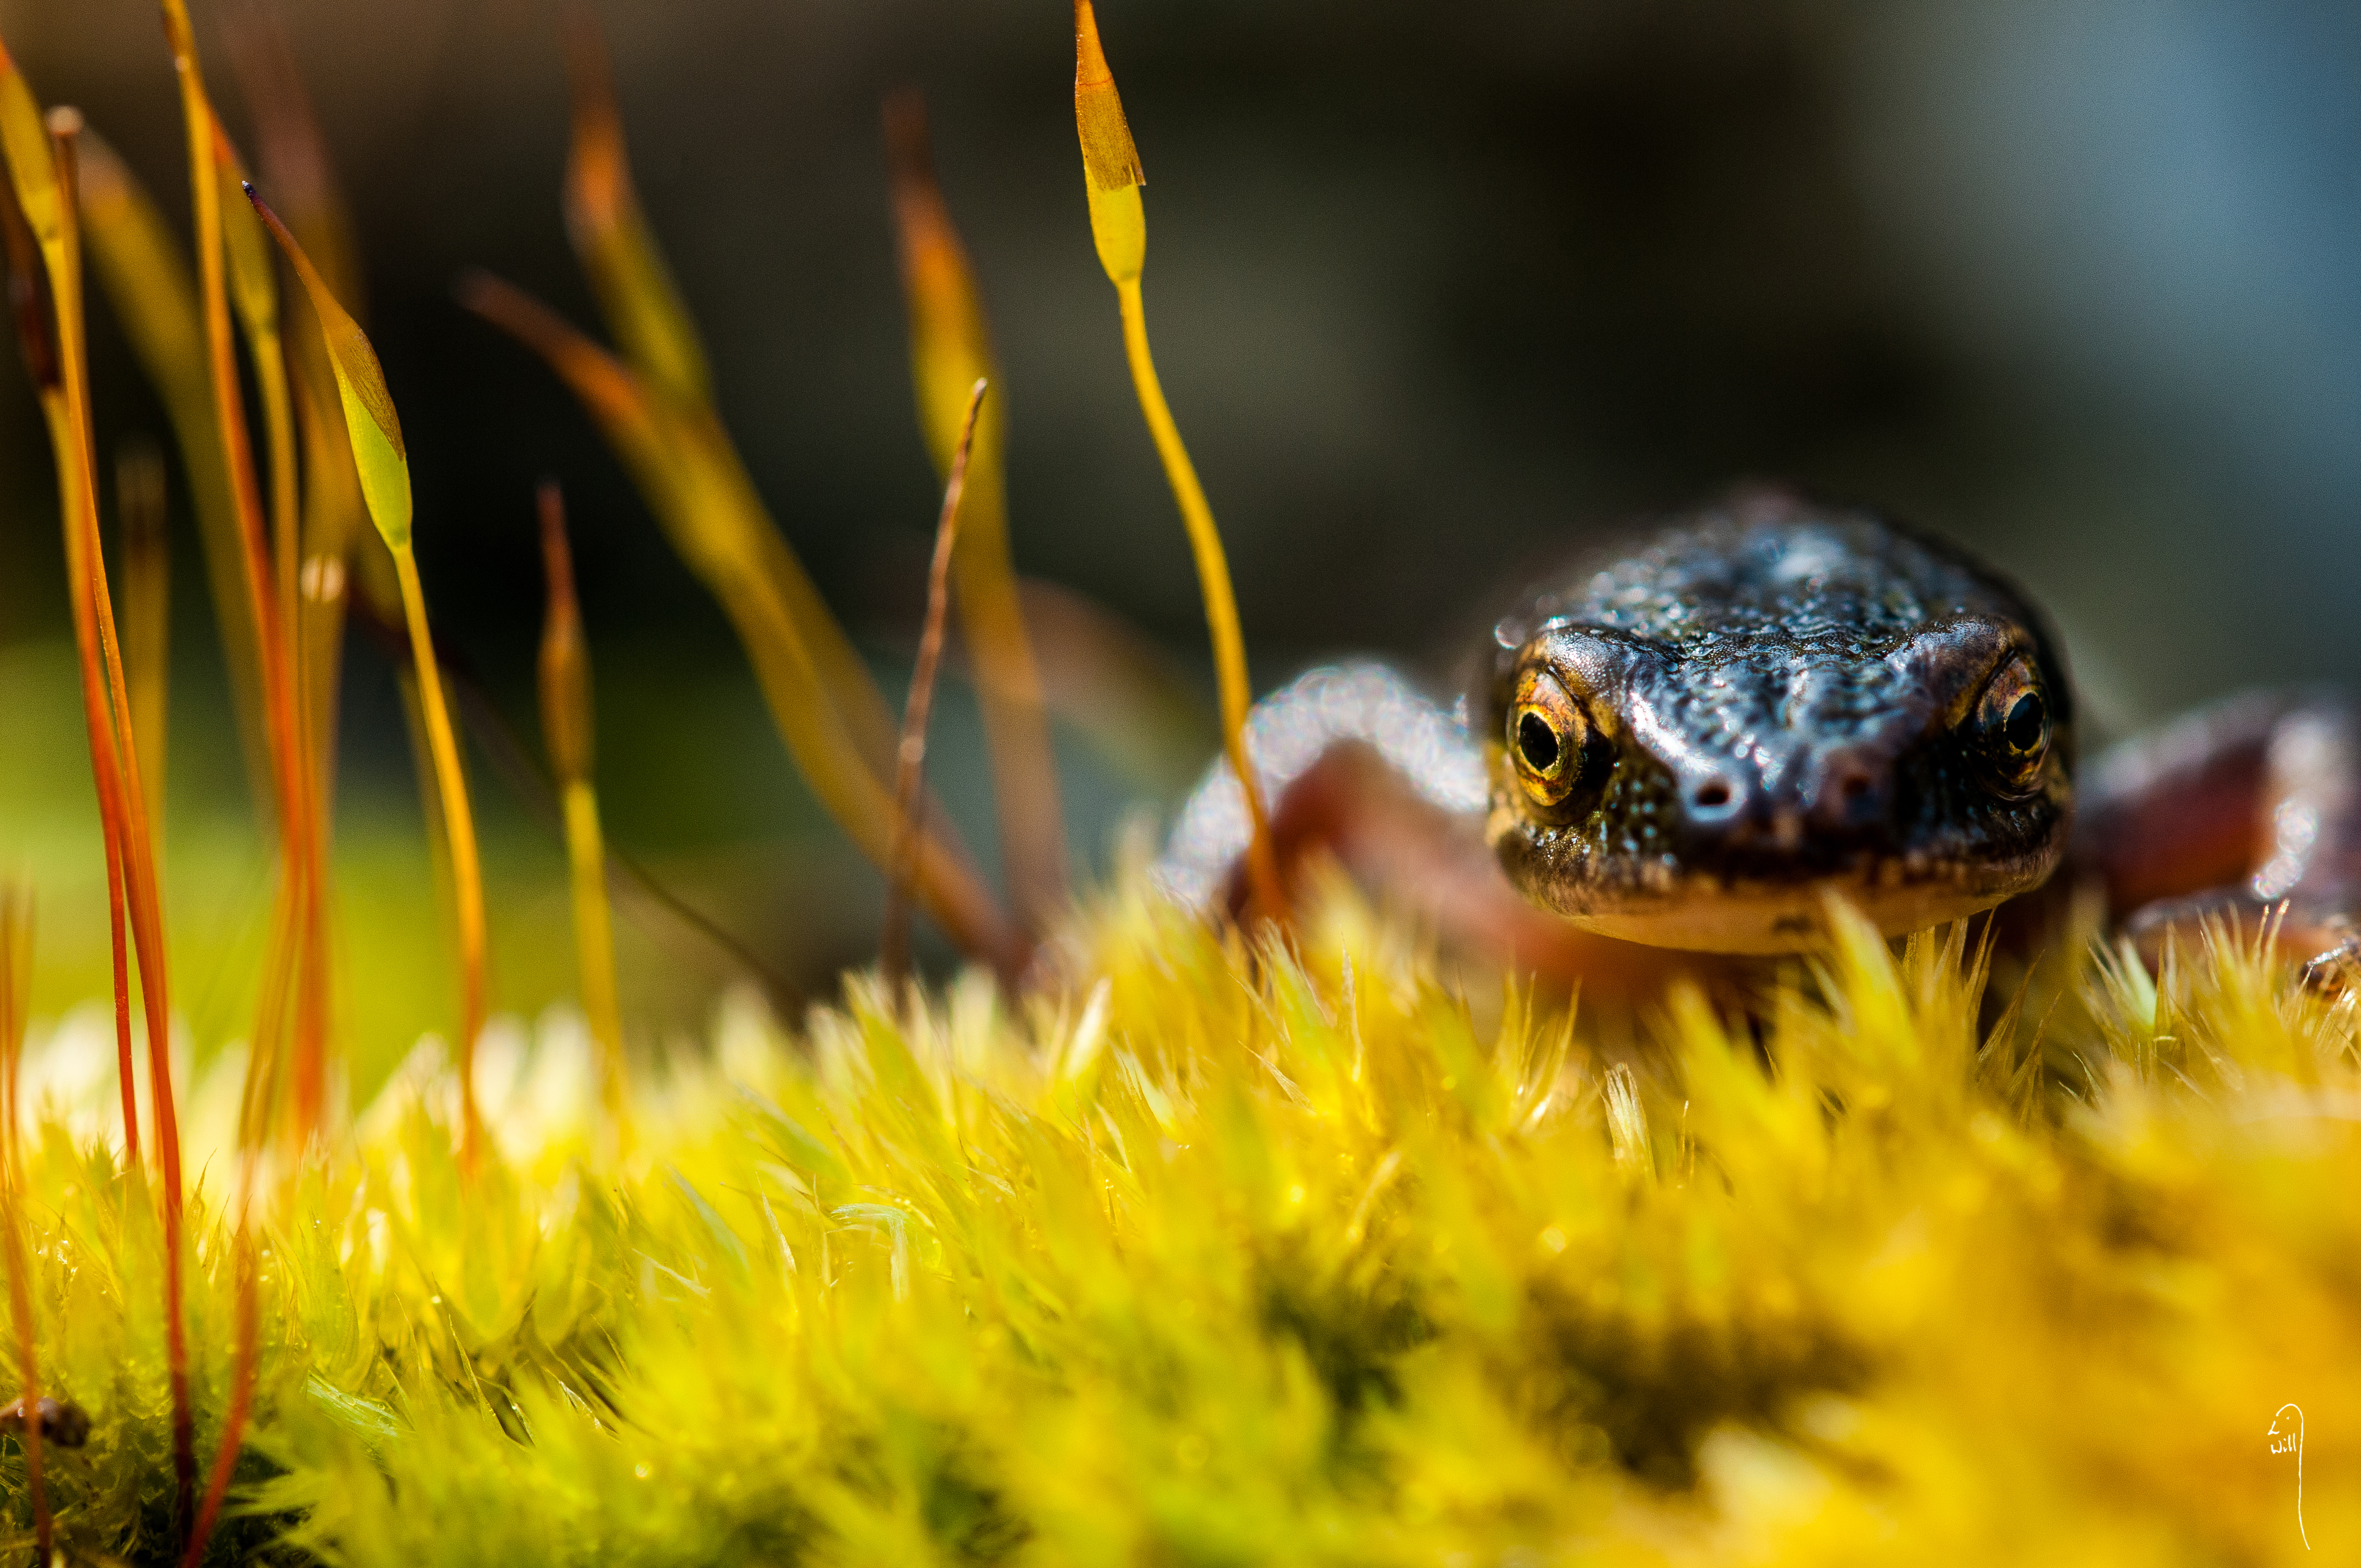 Common Newt on Moss